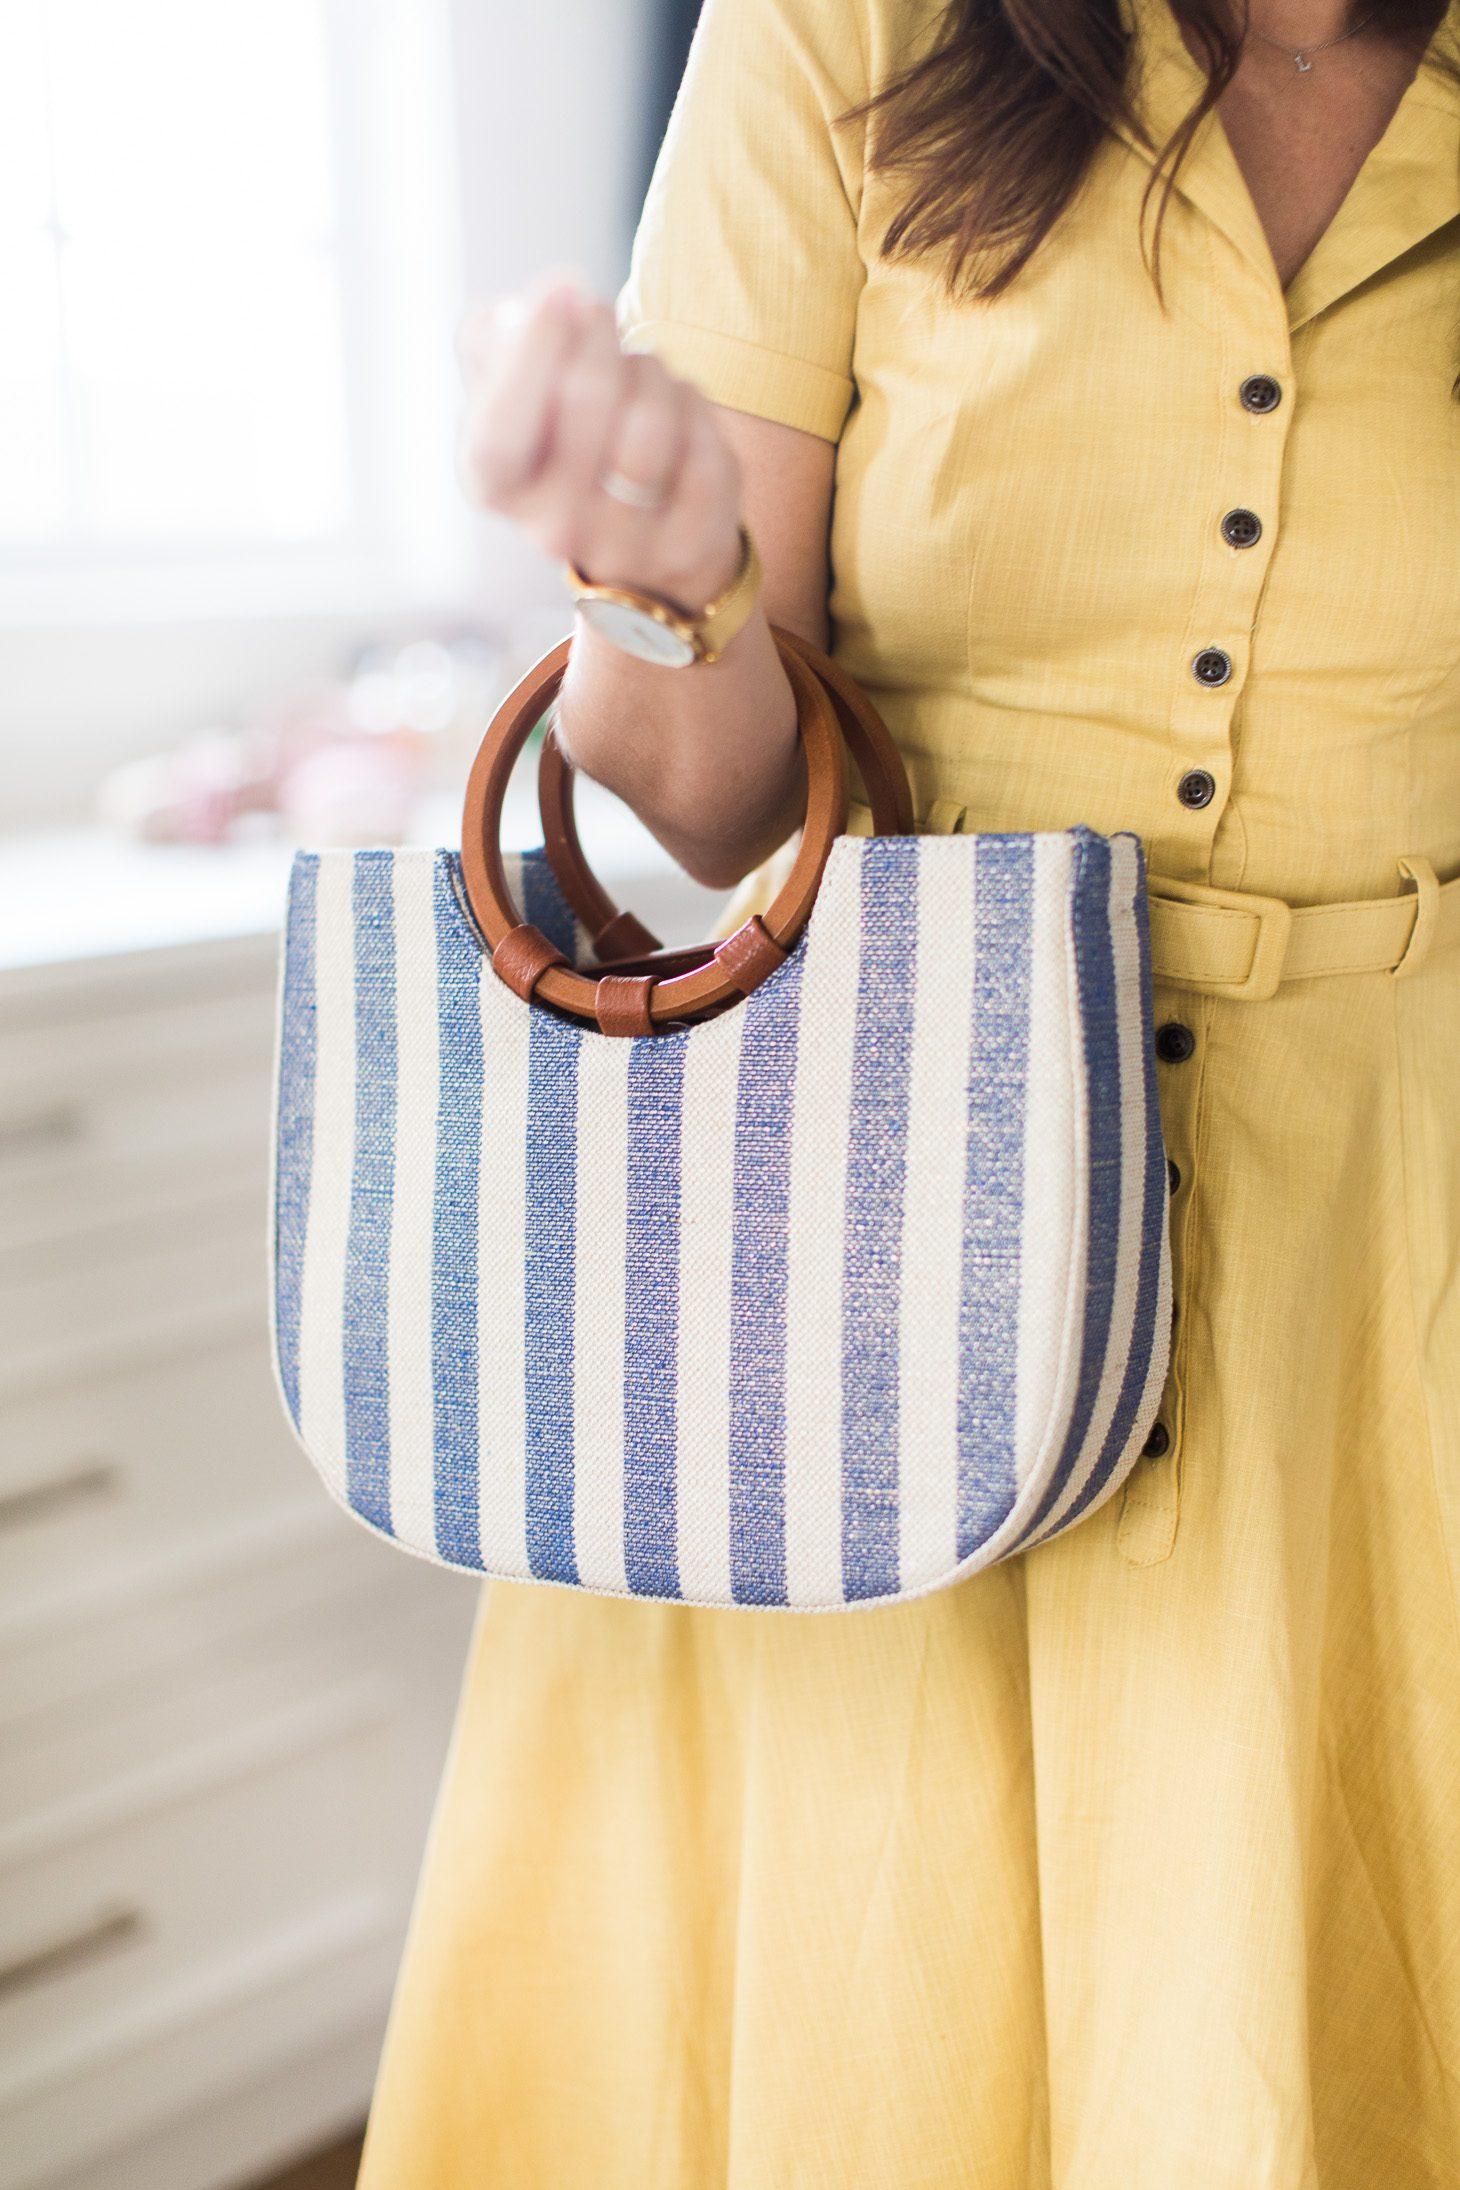 Jillian Harris Versatile Dresses for Your Wardrobe